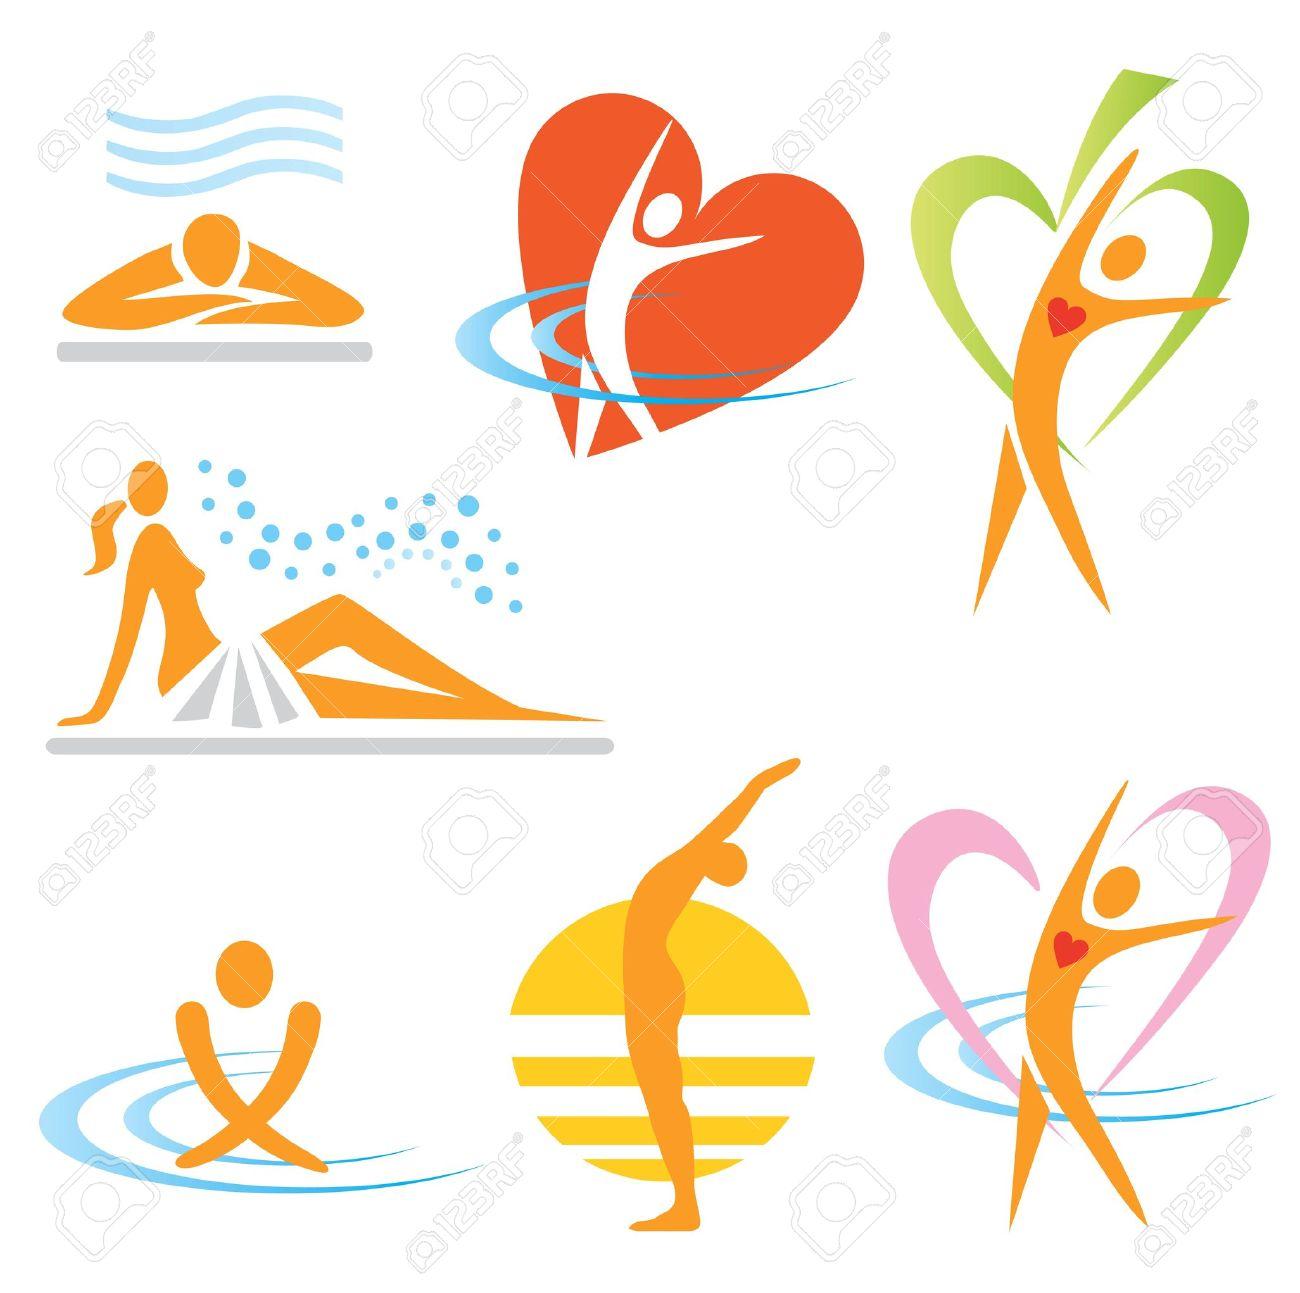 Spa wellness logo  Health And Wellness Stock Photos. Royalty Free Health And Wellness ...